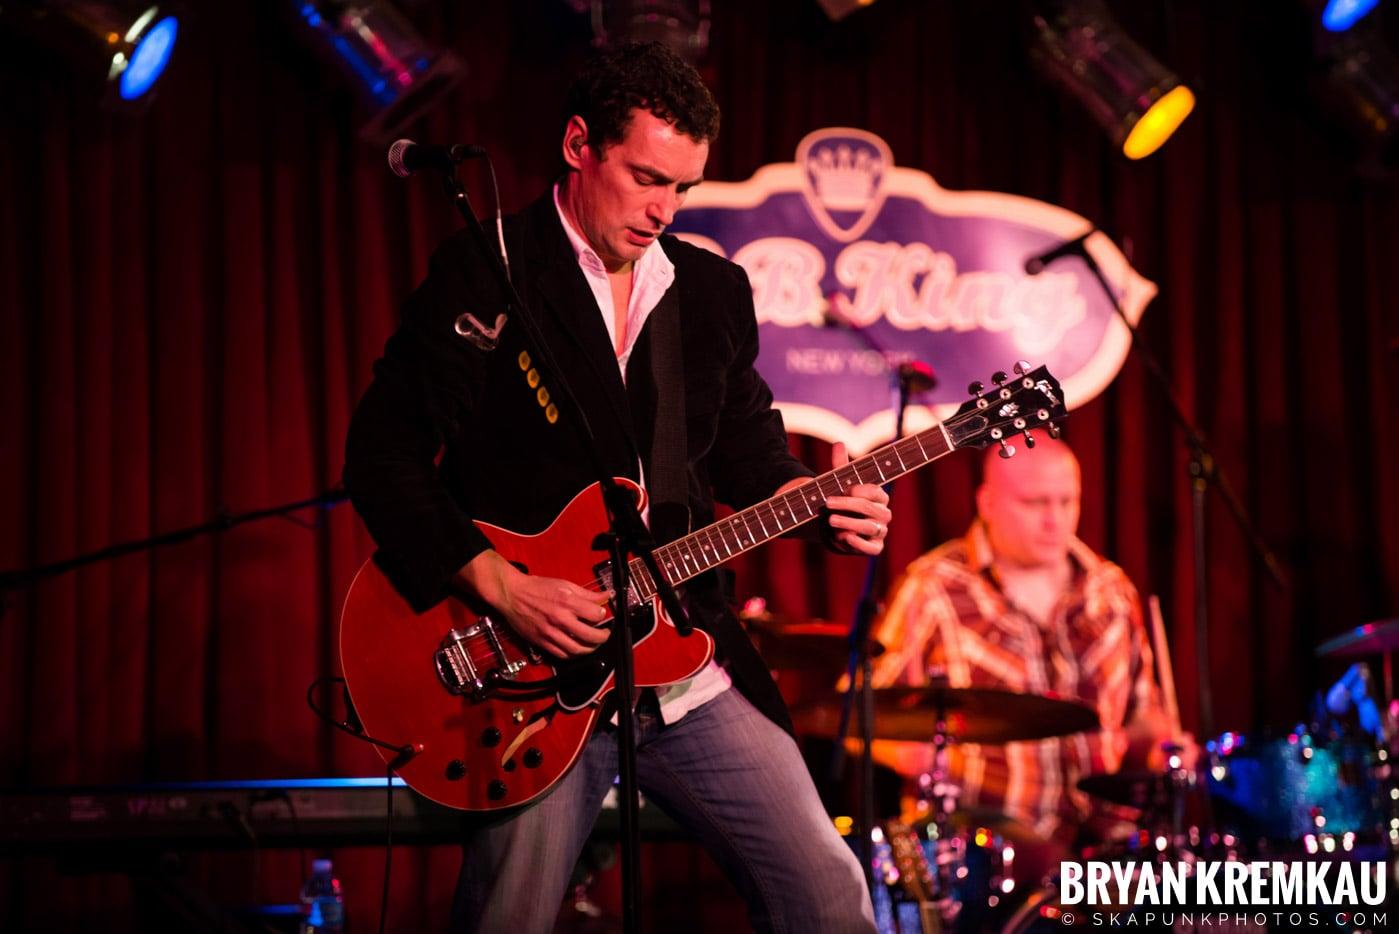 Alan Doyle @ B.B. King Blues & Grill, NYC - 1.11.13 (24)